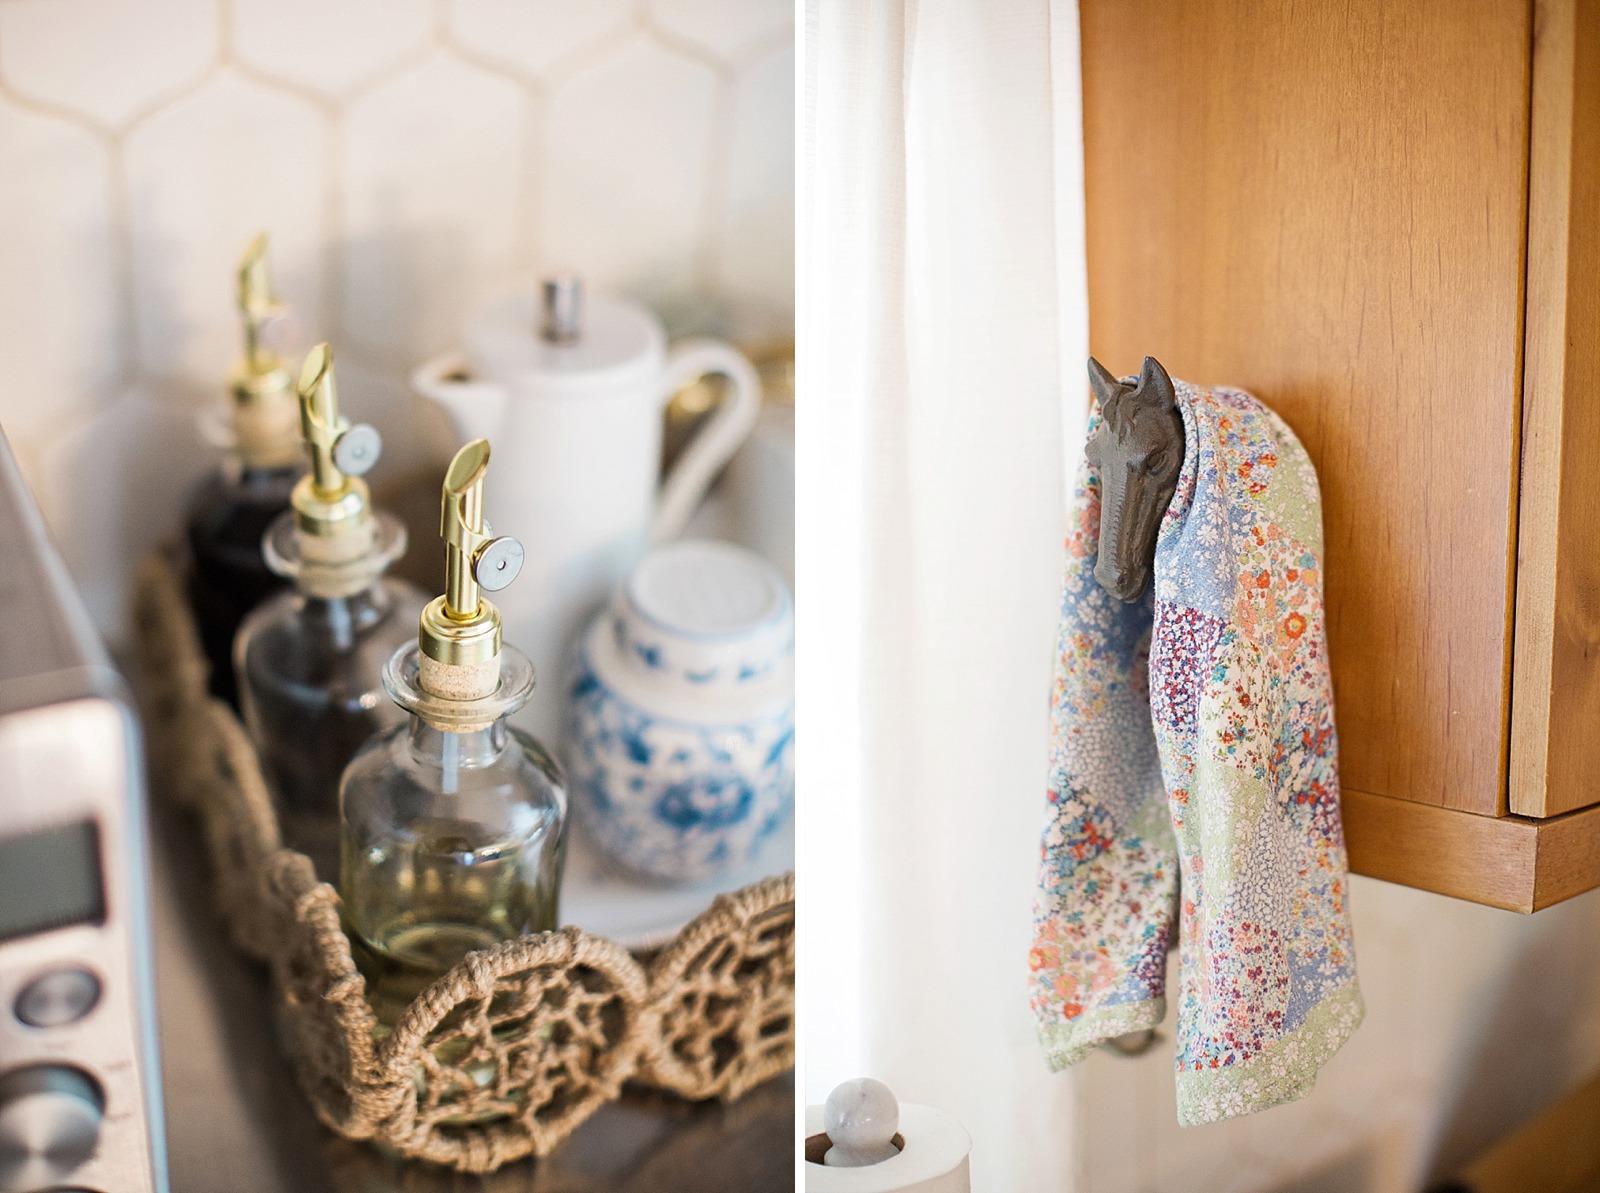 kitchen-diana-elizabeth-photography-blog-walker-zanger-cocoon-6th-avenue-mosaic-tile-white-tile-backsplash-9672